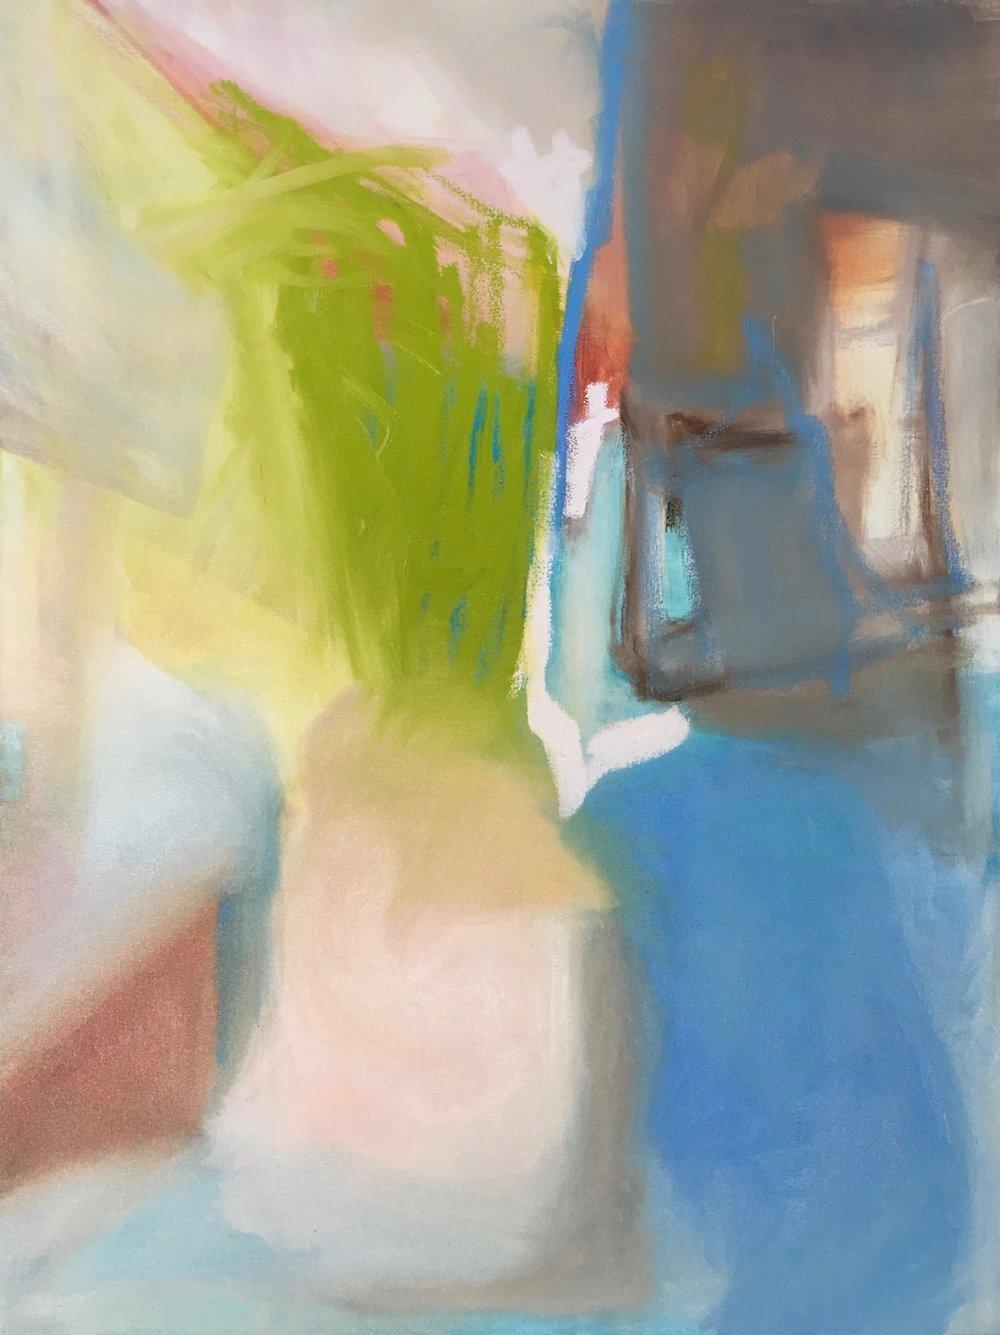 Spring Season, Oil on Canvas, 40 x 30